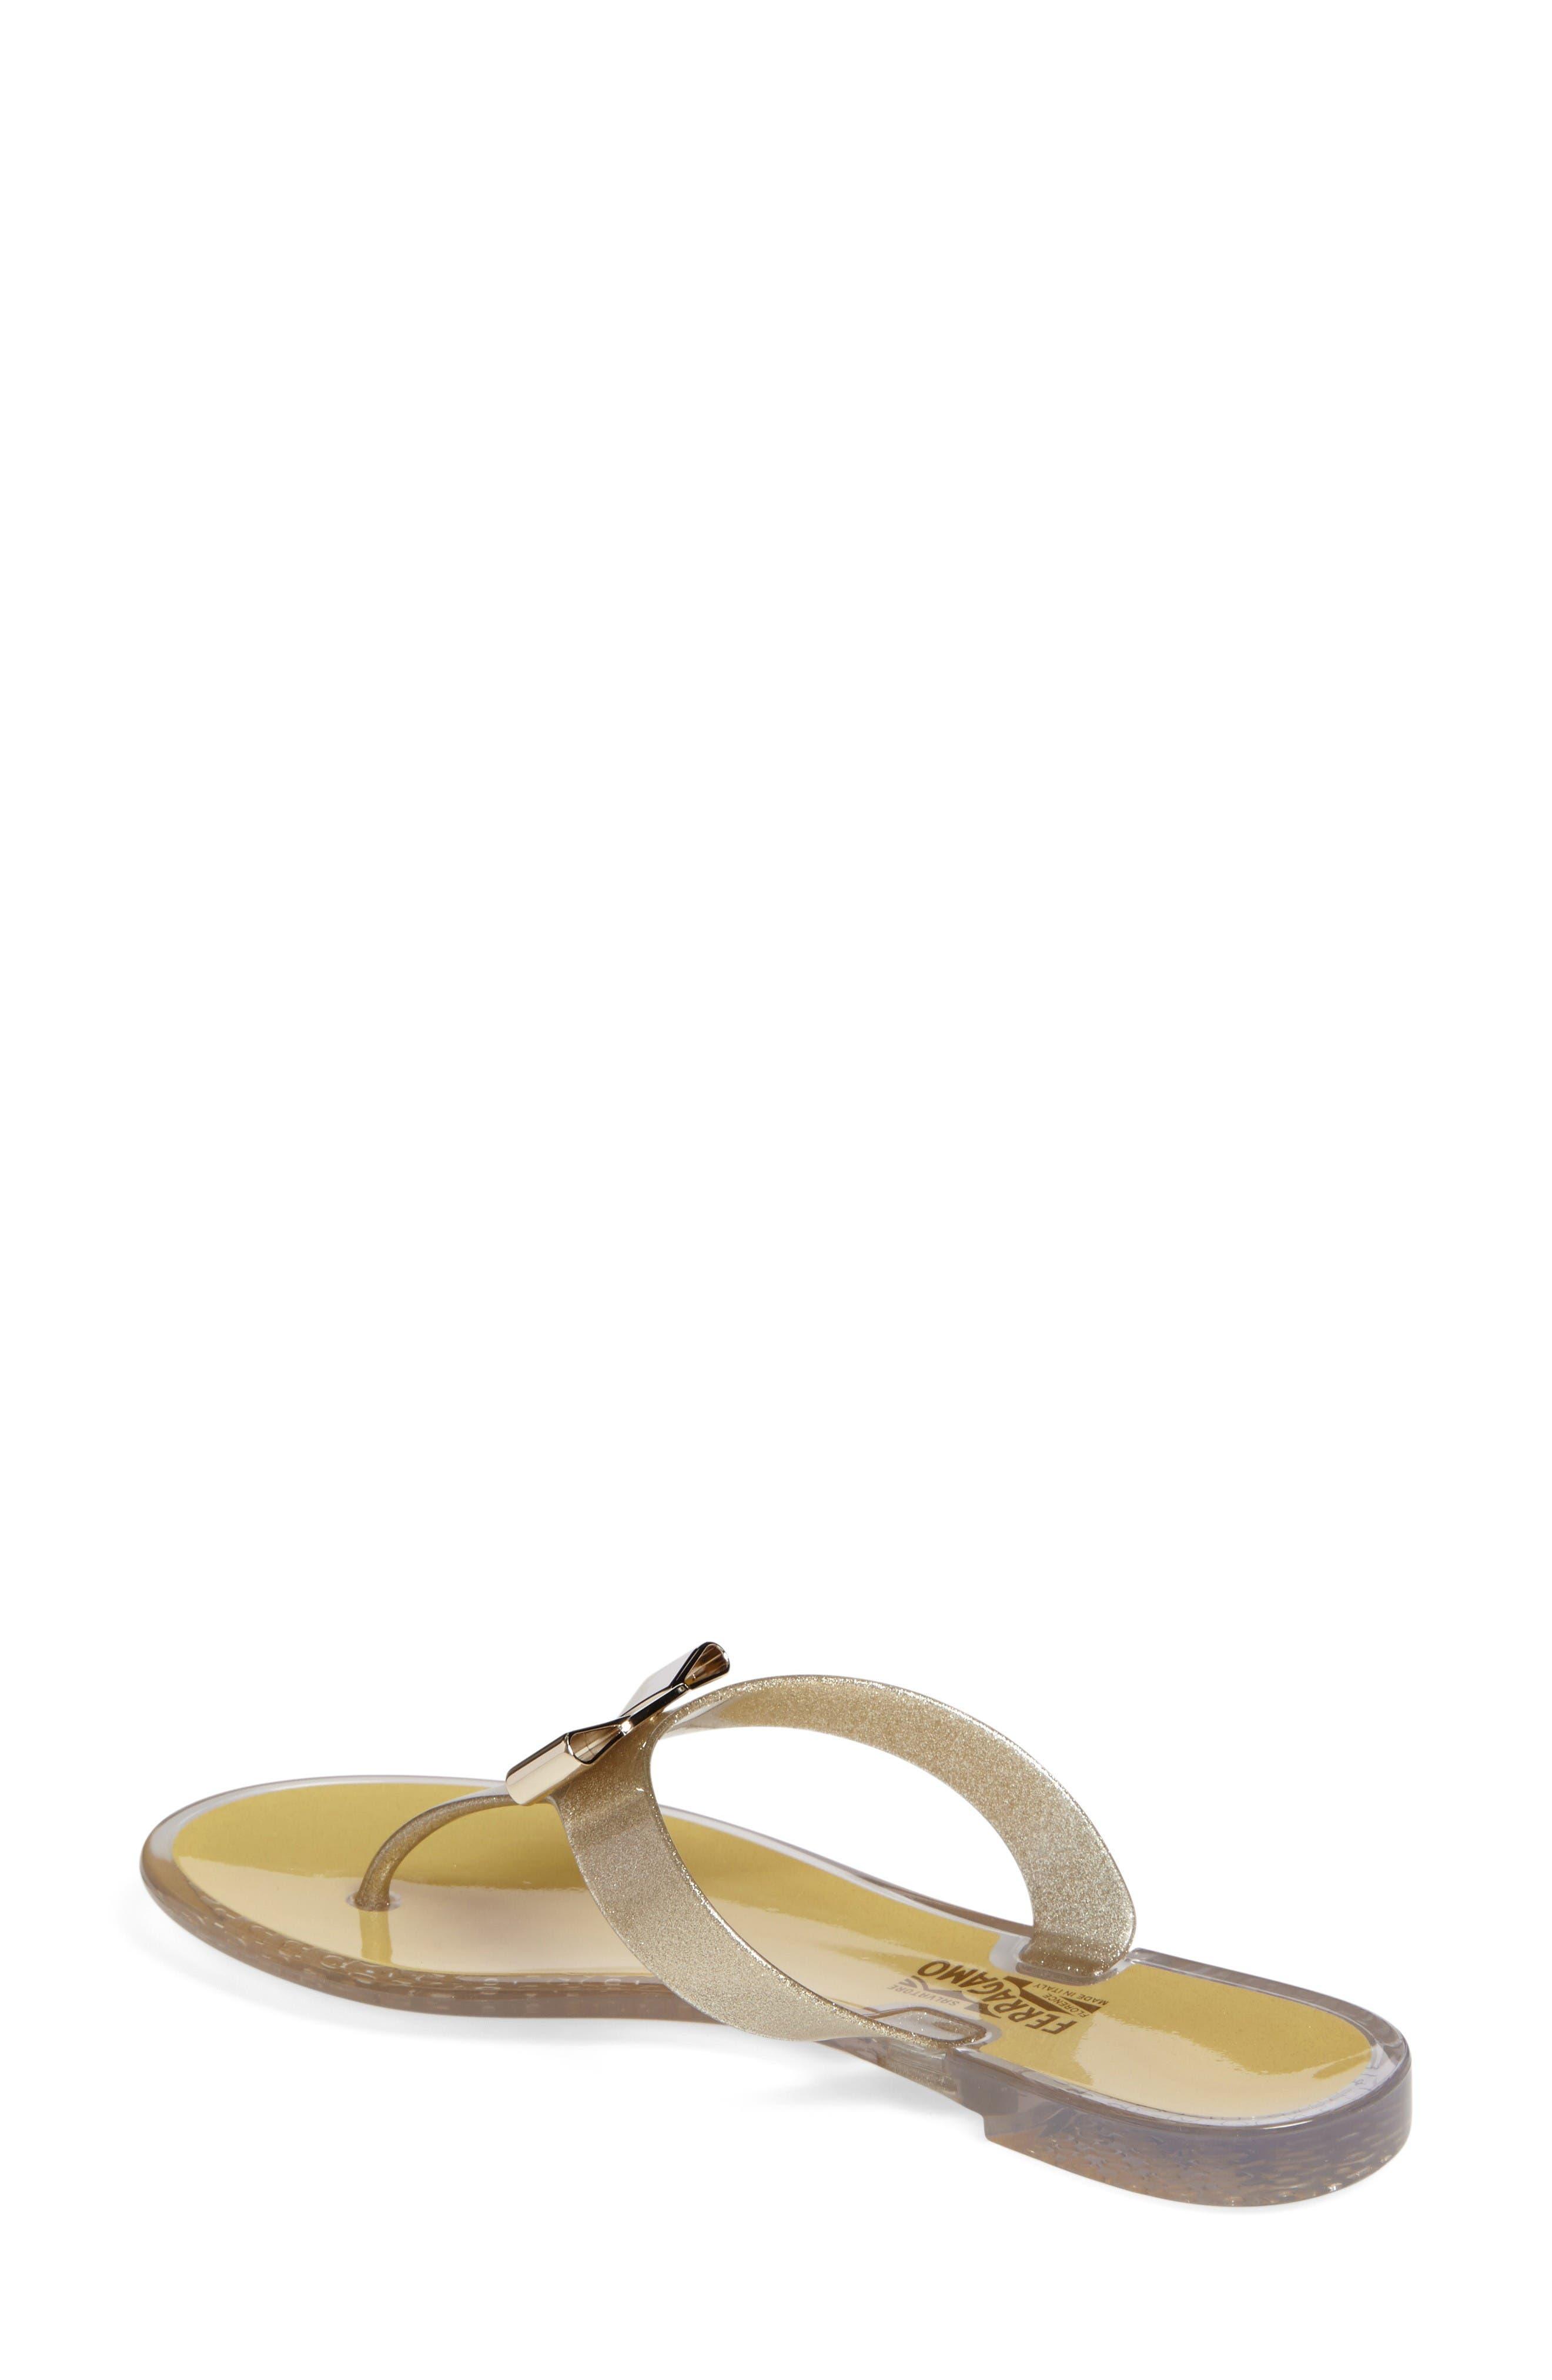 Alternate Image 2  - Salvatore Ferragamo Jelly Flat Bow Sandal (Women)